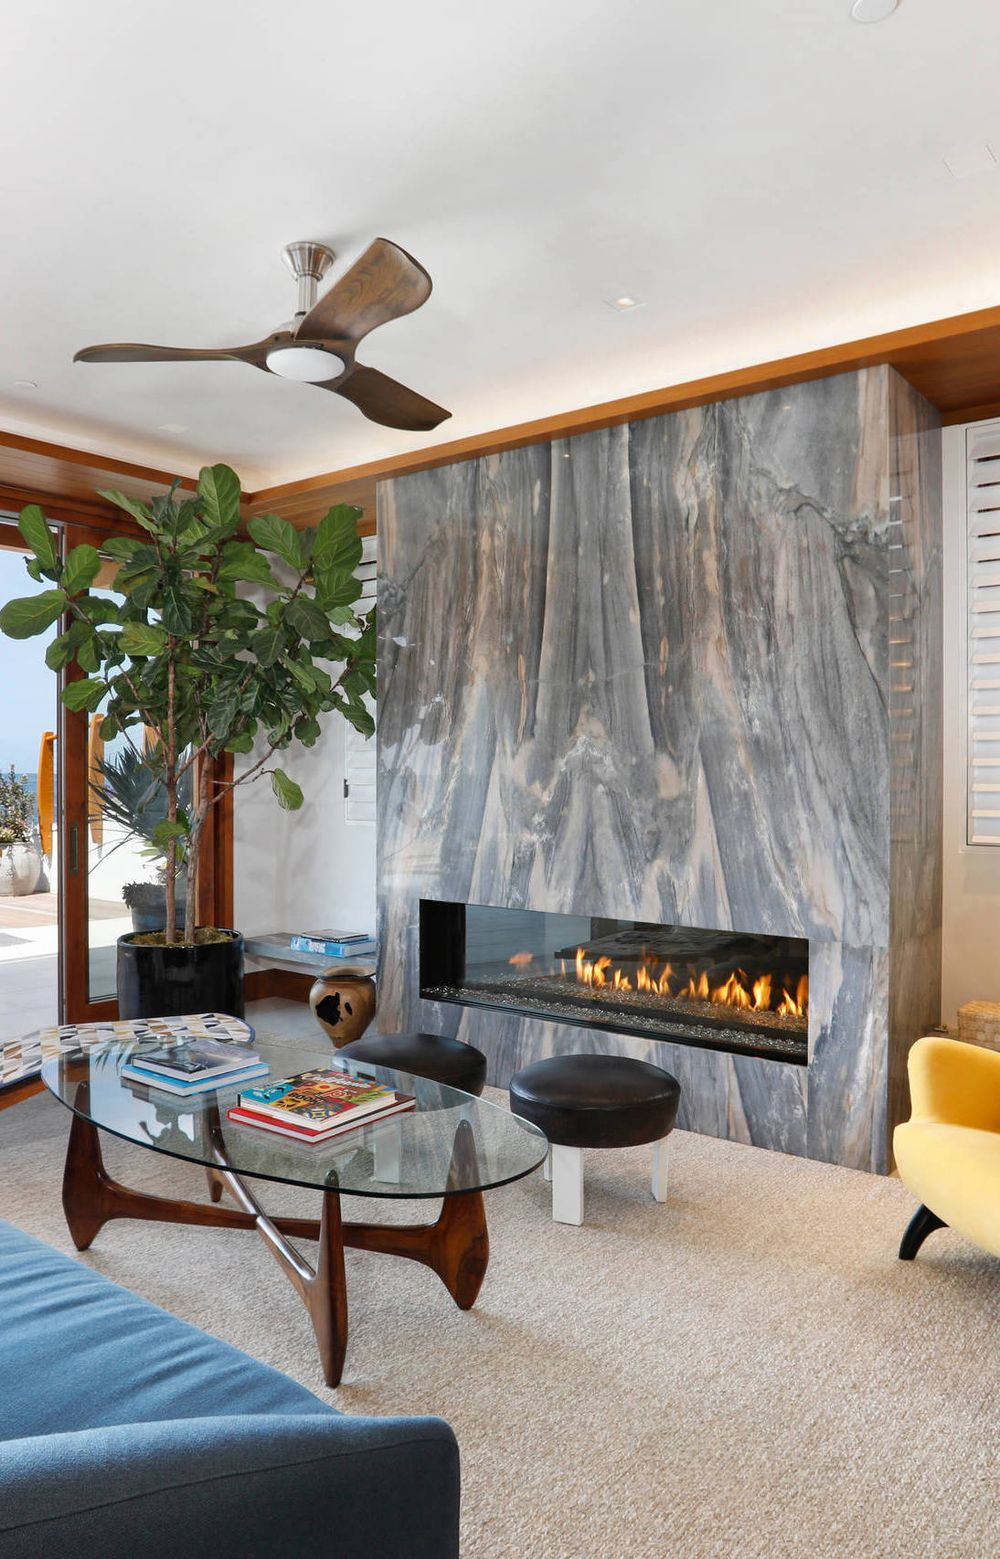 15 Mid Century Modern Fireplace Design Ideas